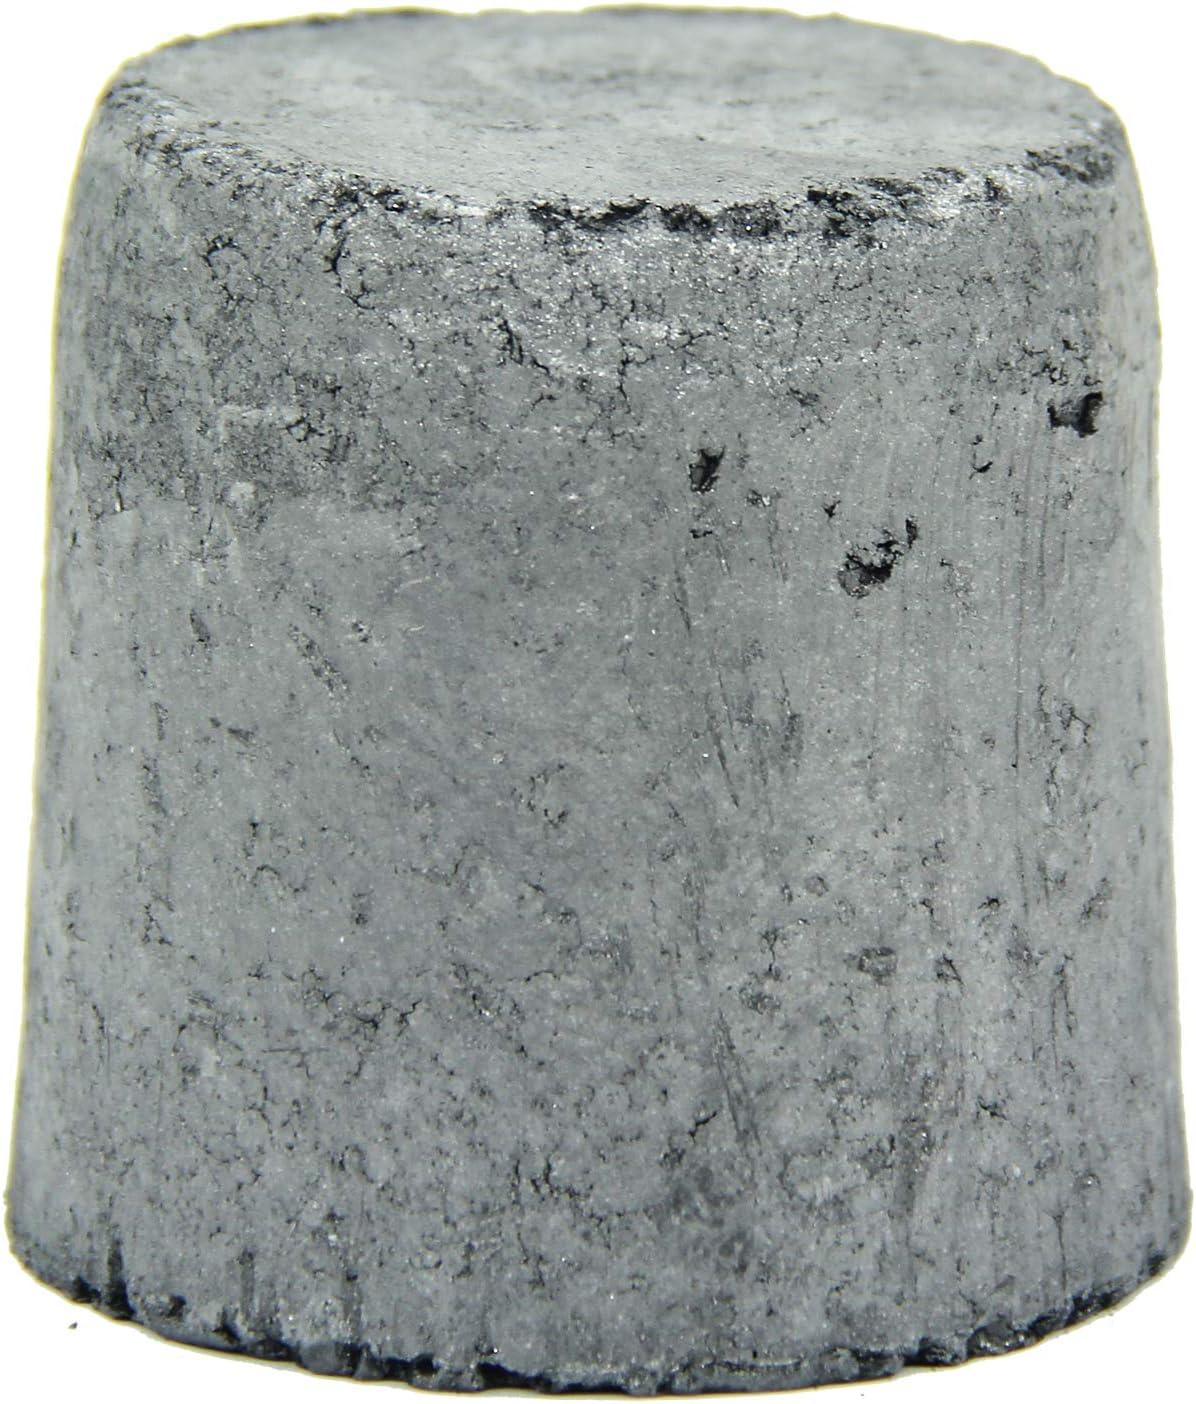 Max Melting Copper 1.6KG Graphite Ingot Mold Melting Casting Mould for Gold Silver Aluminum Copper Brass Zinc Alloy Metals Graphite Crucibles Aluminum 600g Silicon Carbide Graphite Crucibles